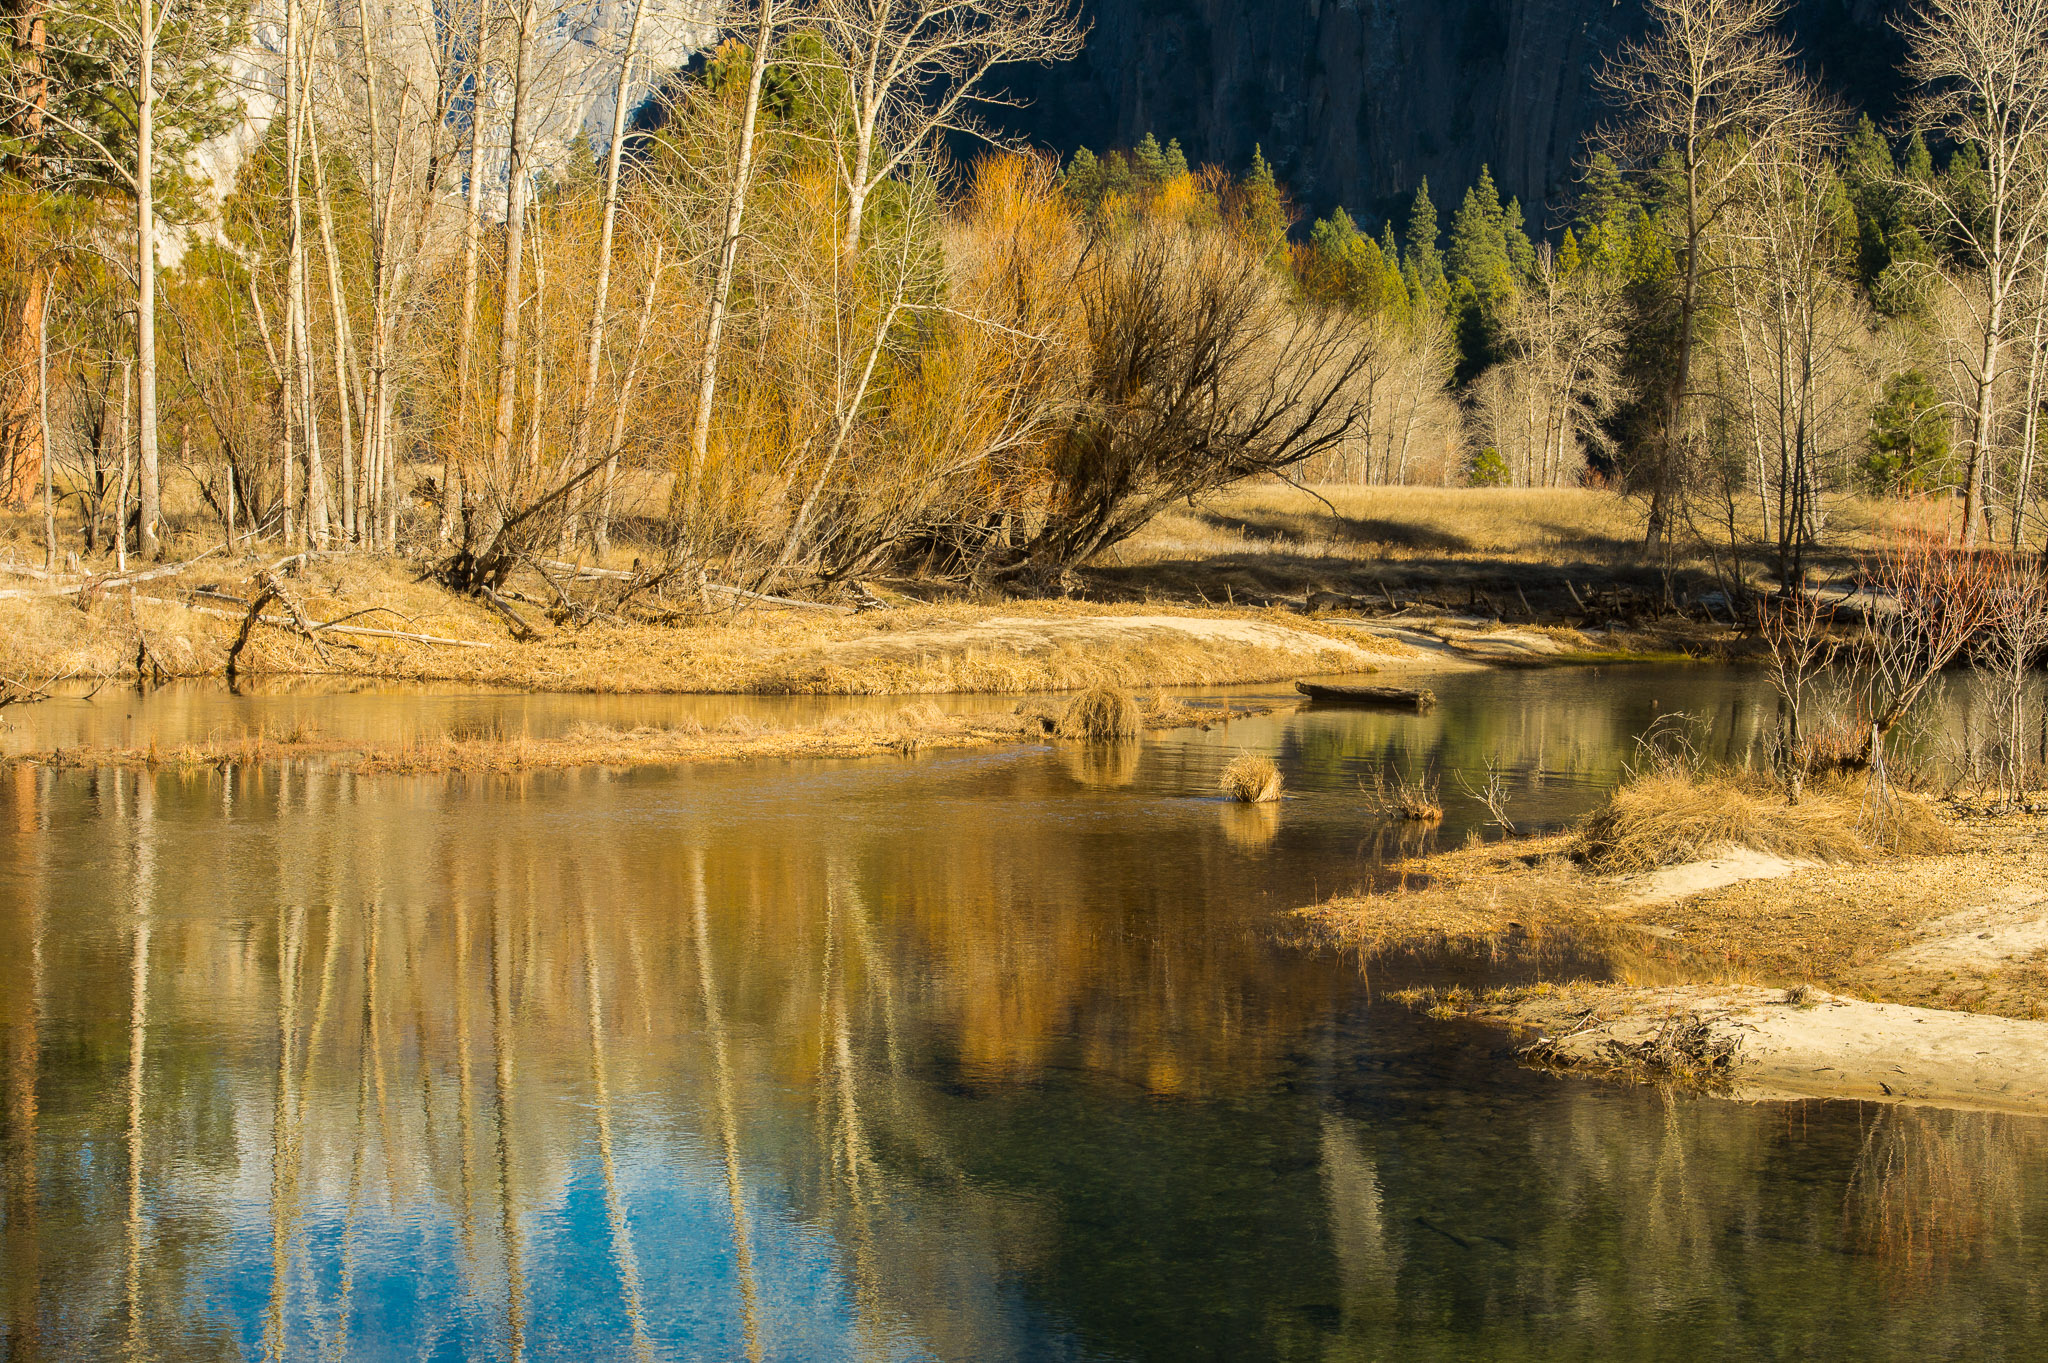 Jason-Davis-Images-Yosemite-0034.jpg